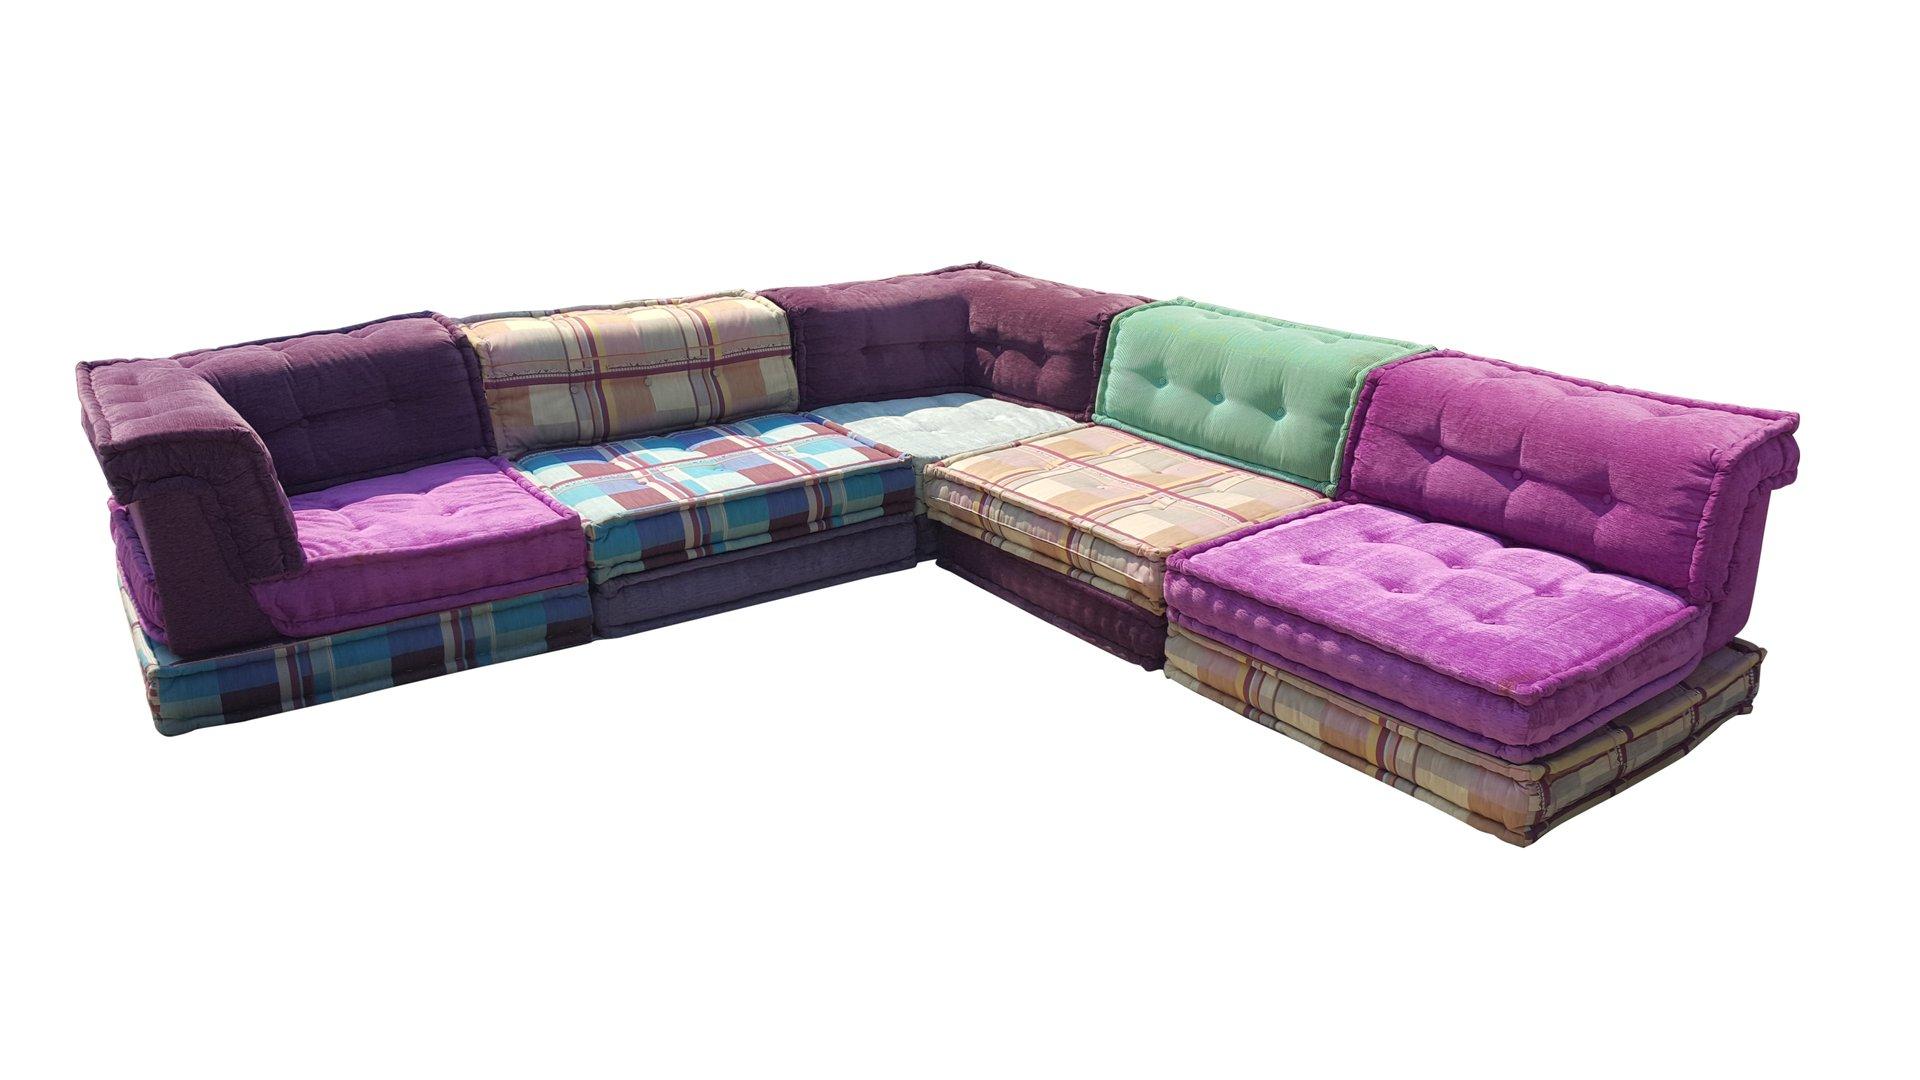 mah jong modular sofa by hopfer hans for roche bobois. Black Bedroom Furniture Sets. Home Design Ideas